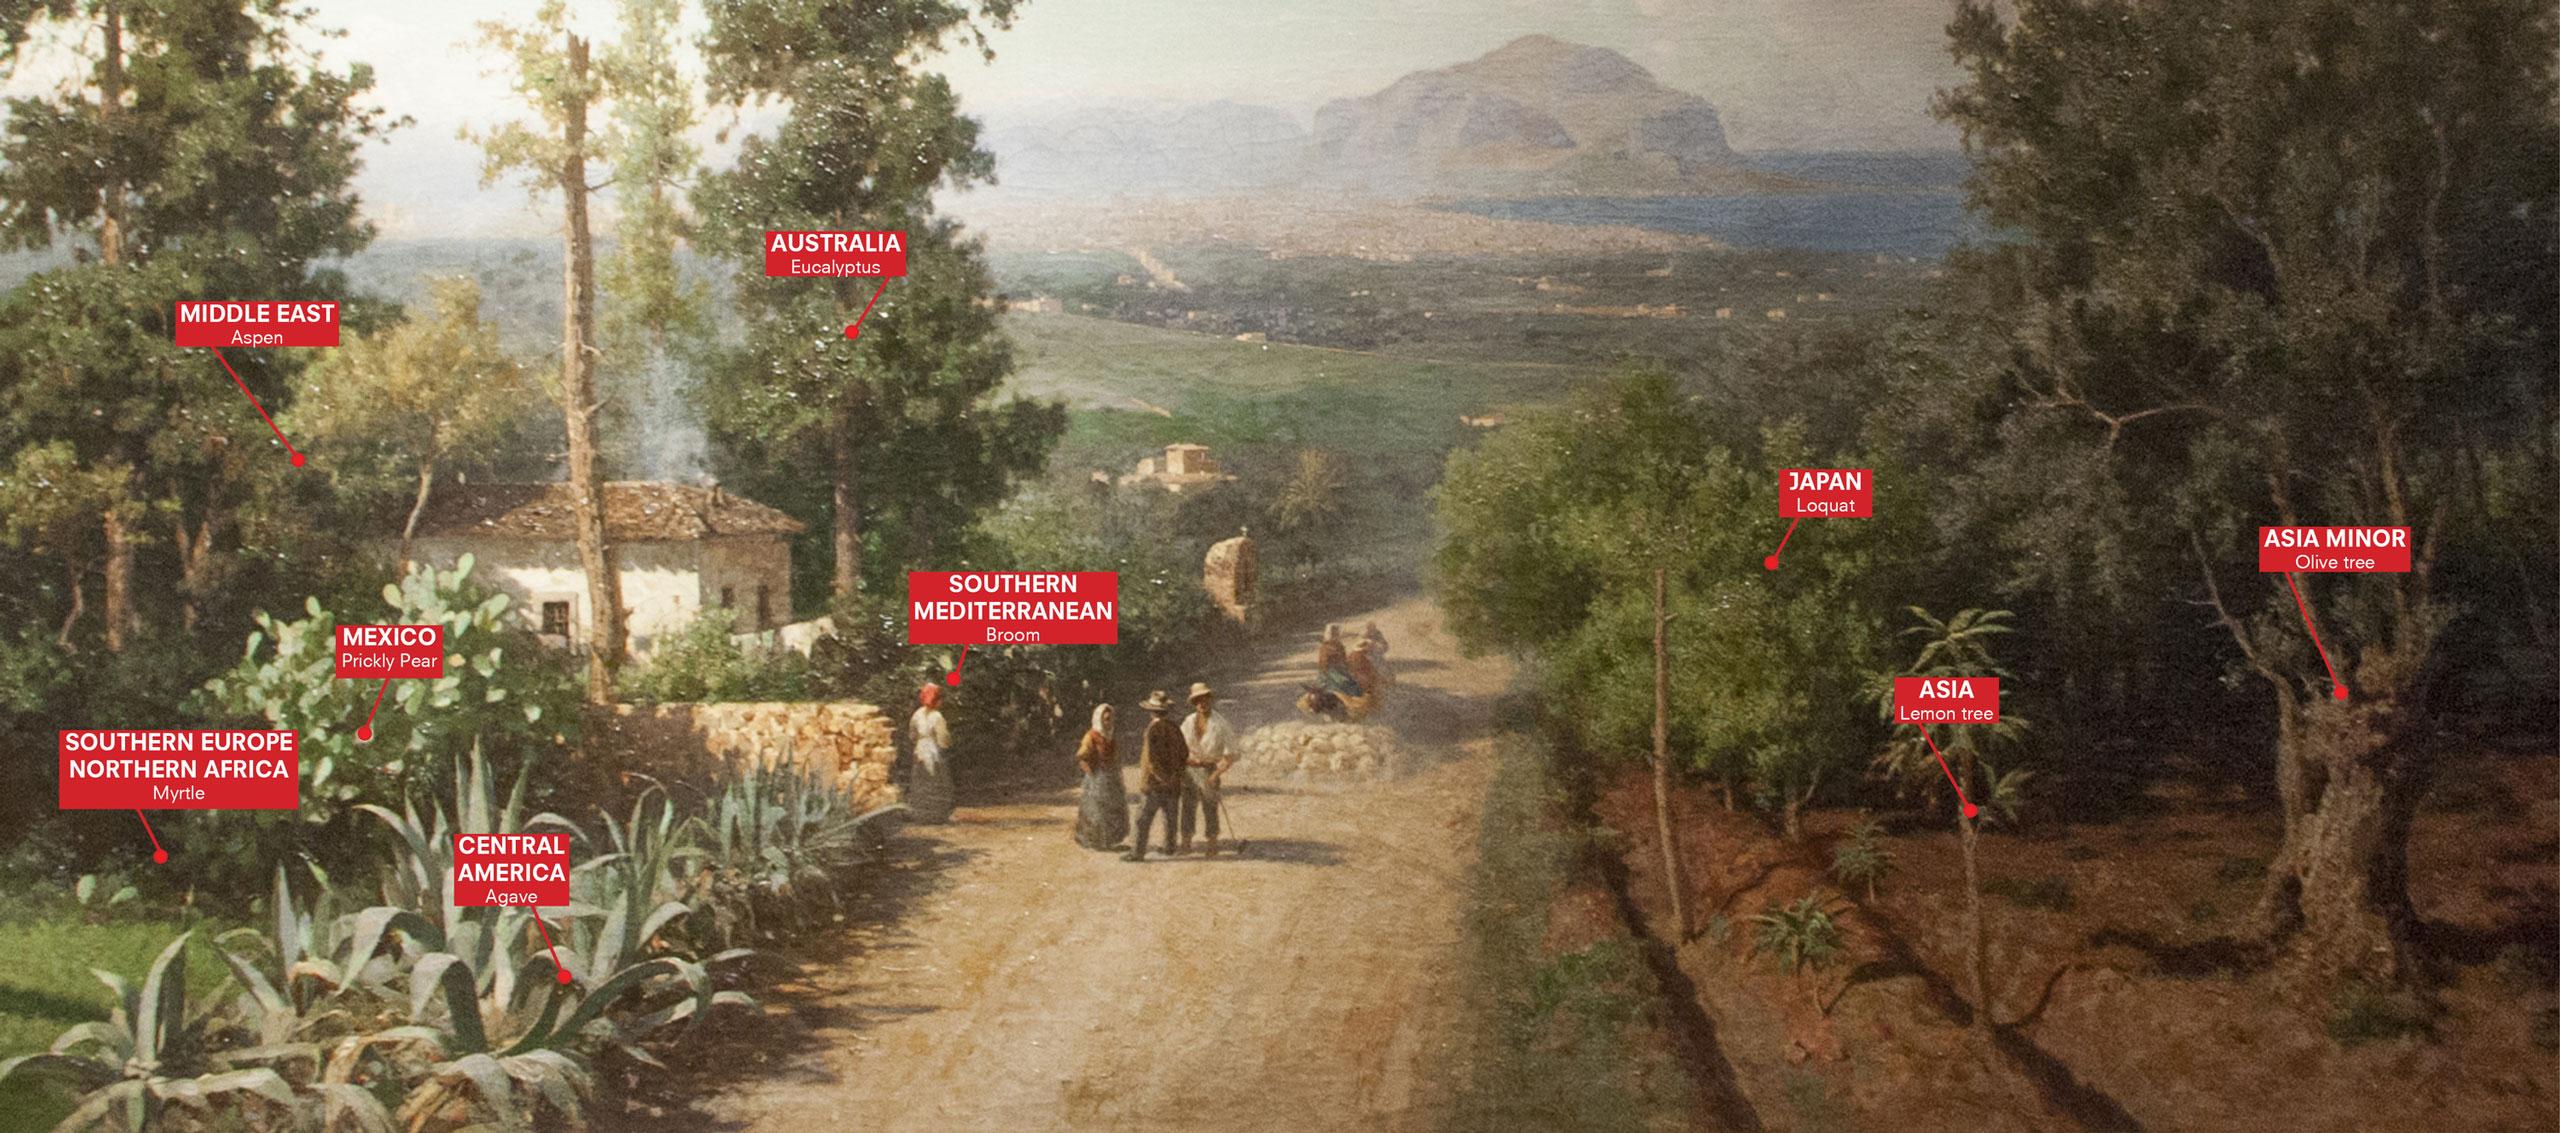 Concept for Manifesta 12 Palermo: \